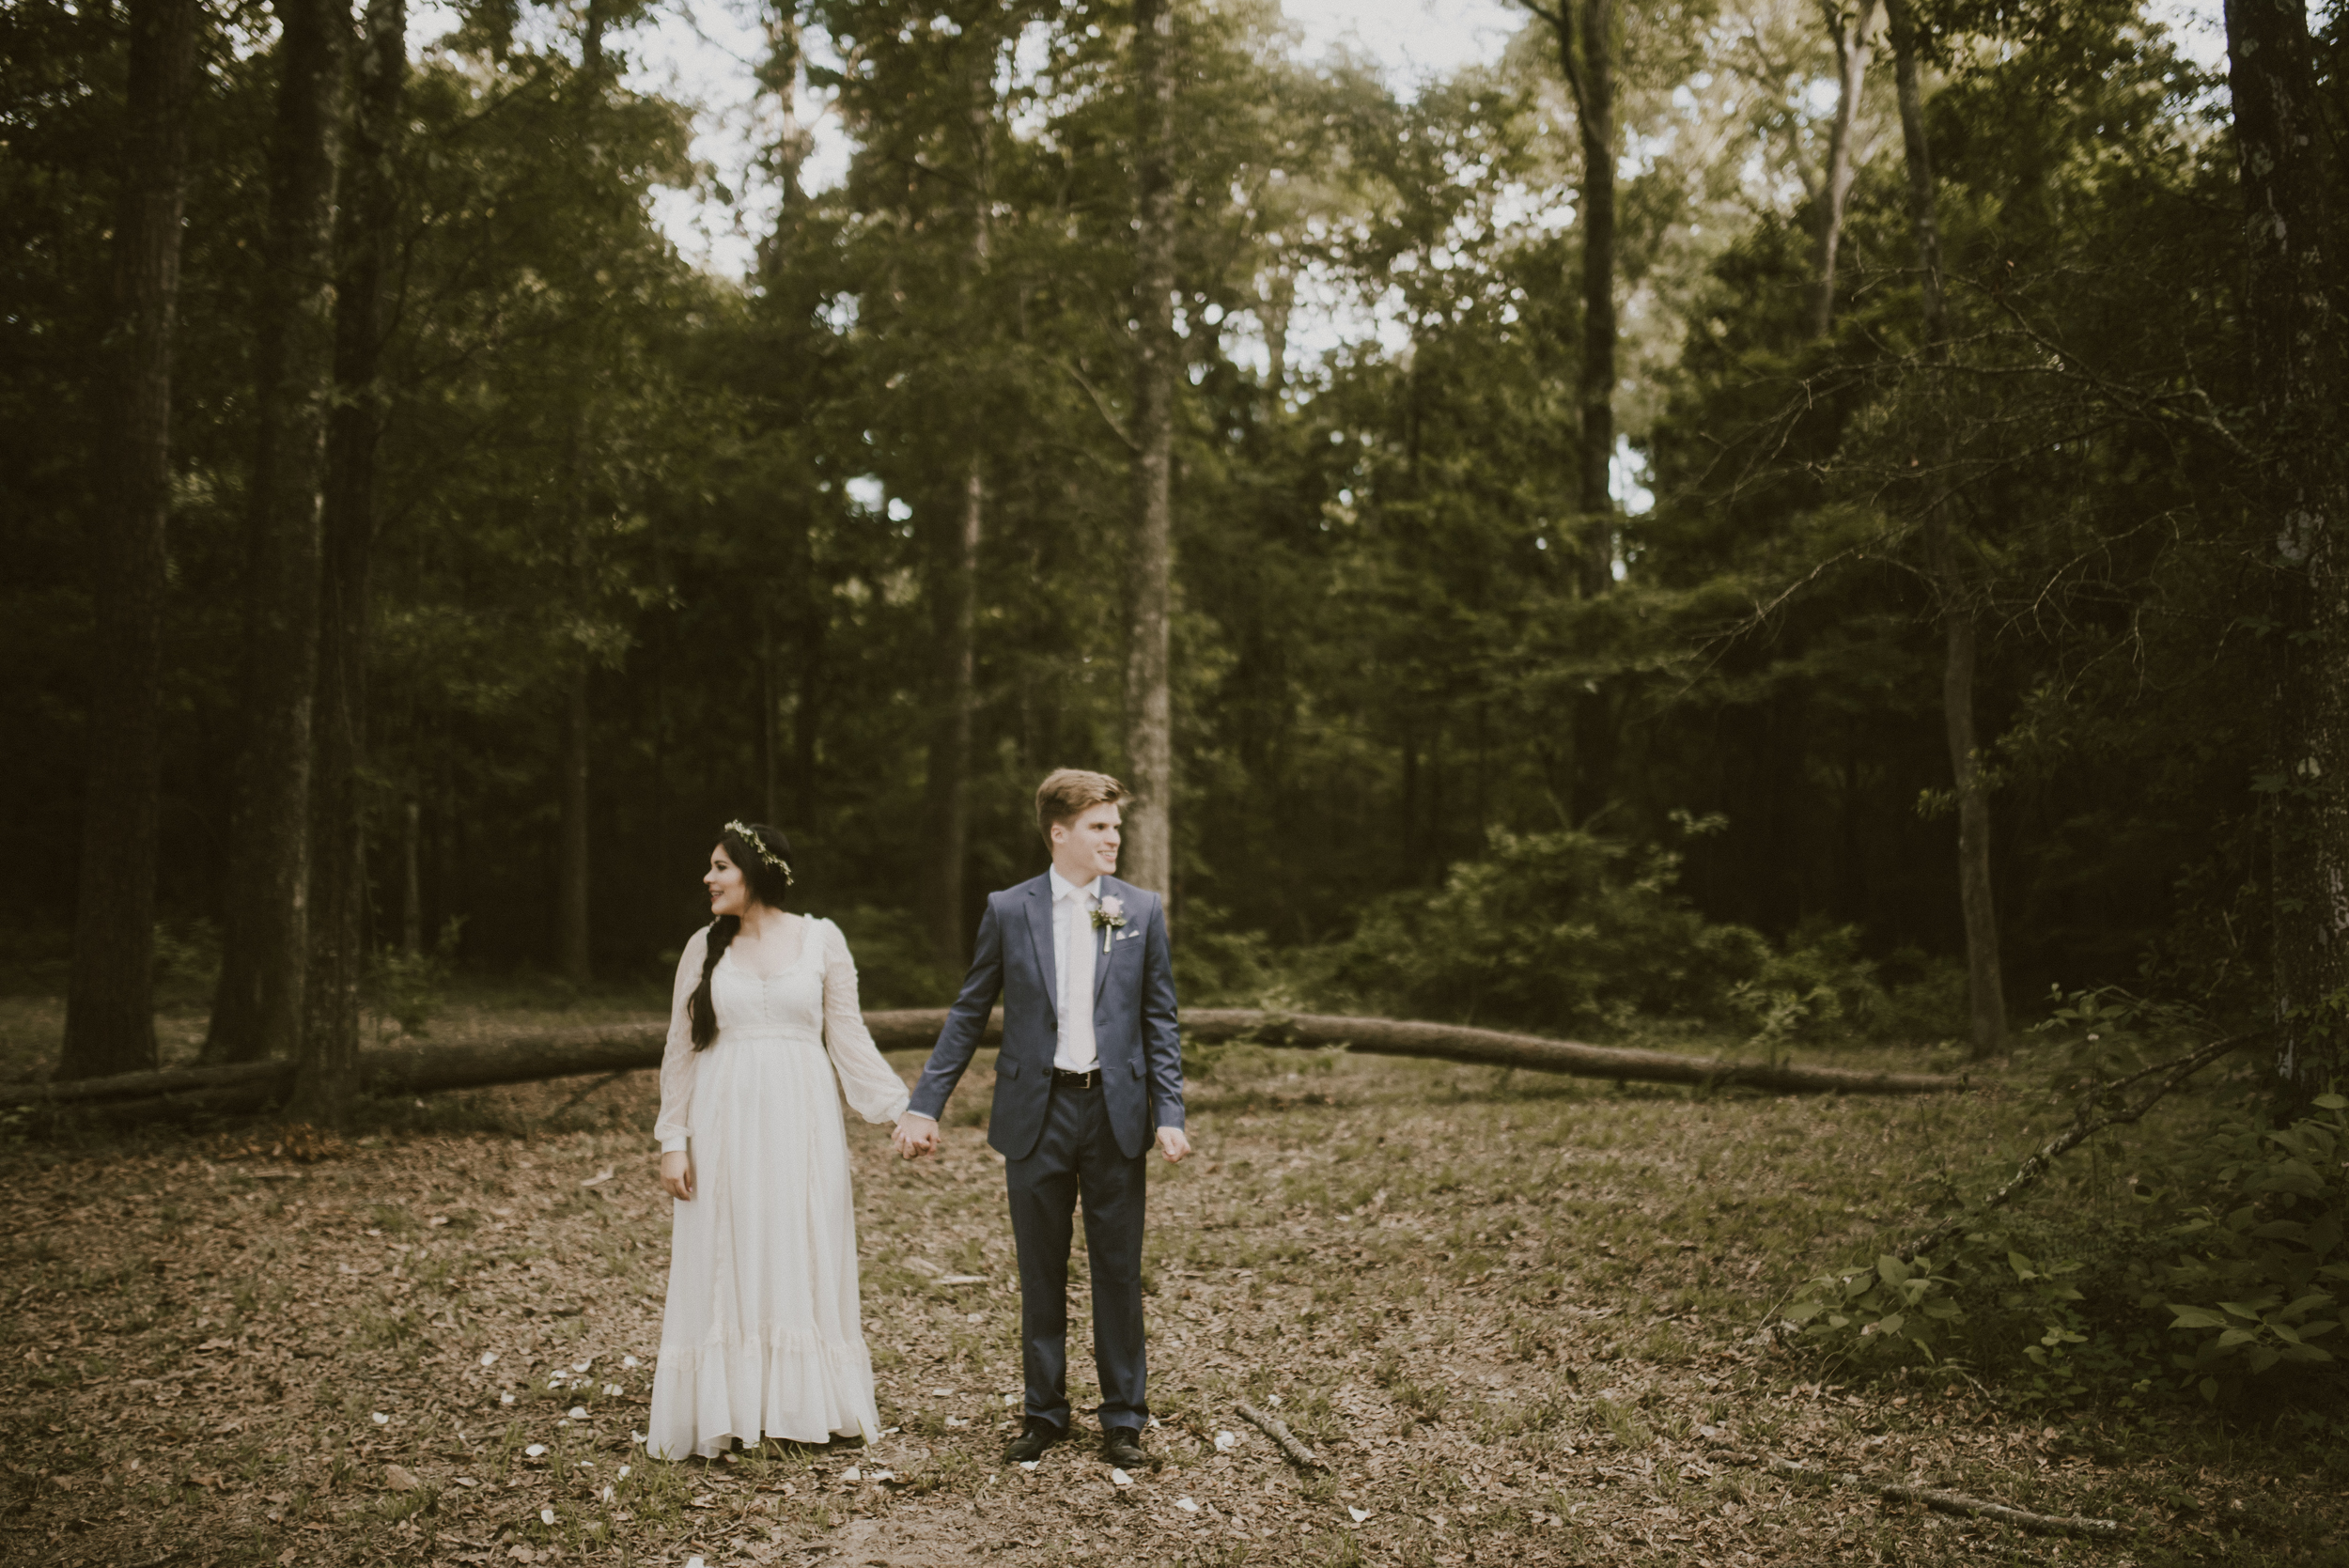 ofRen_weddingphotographer-145.jpg